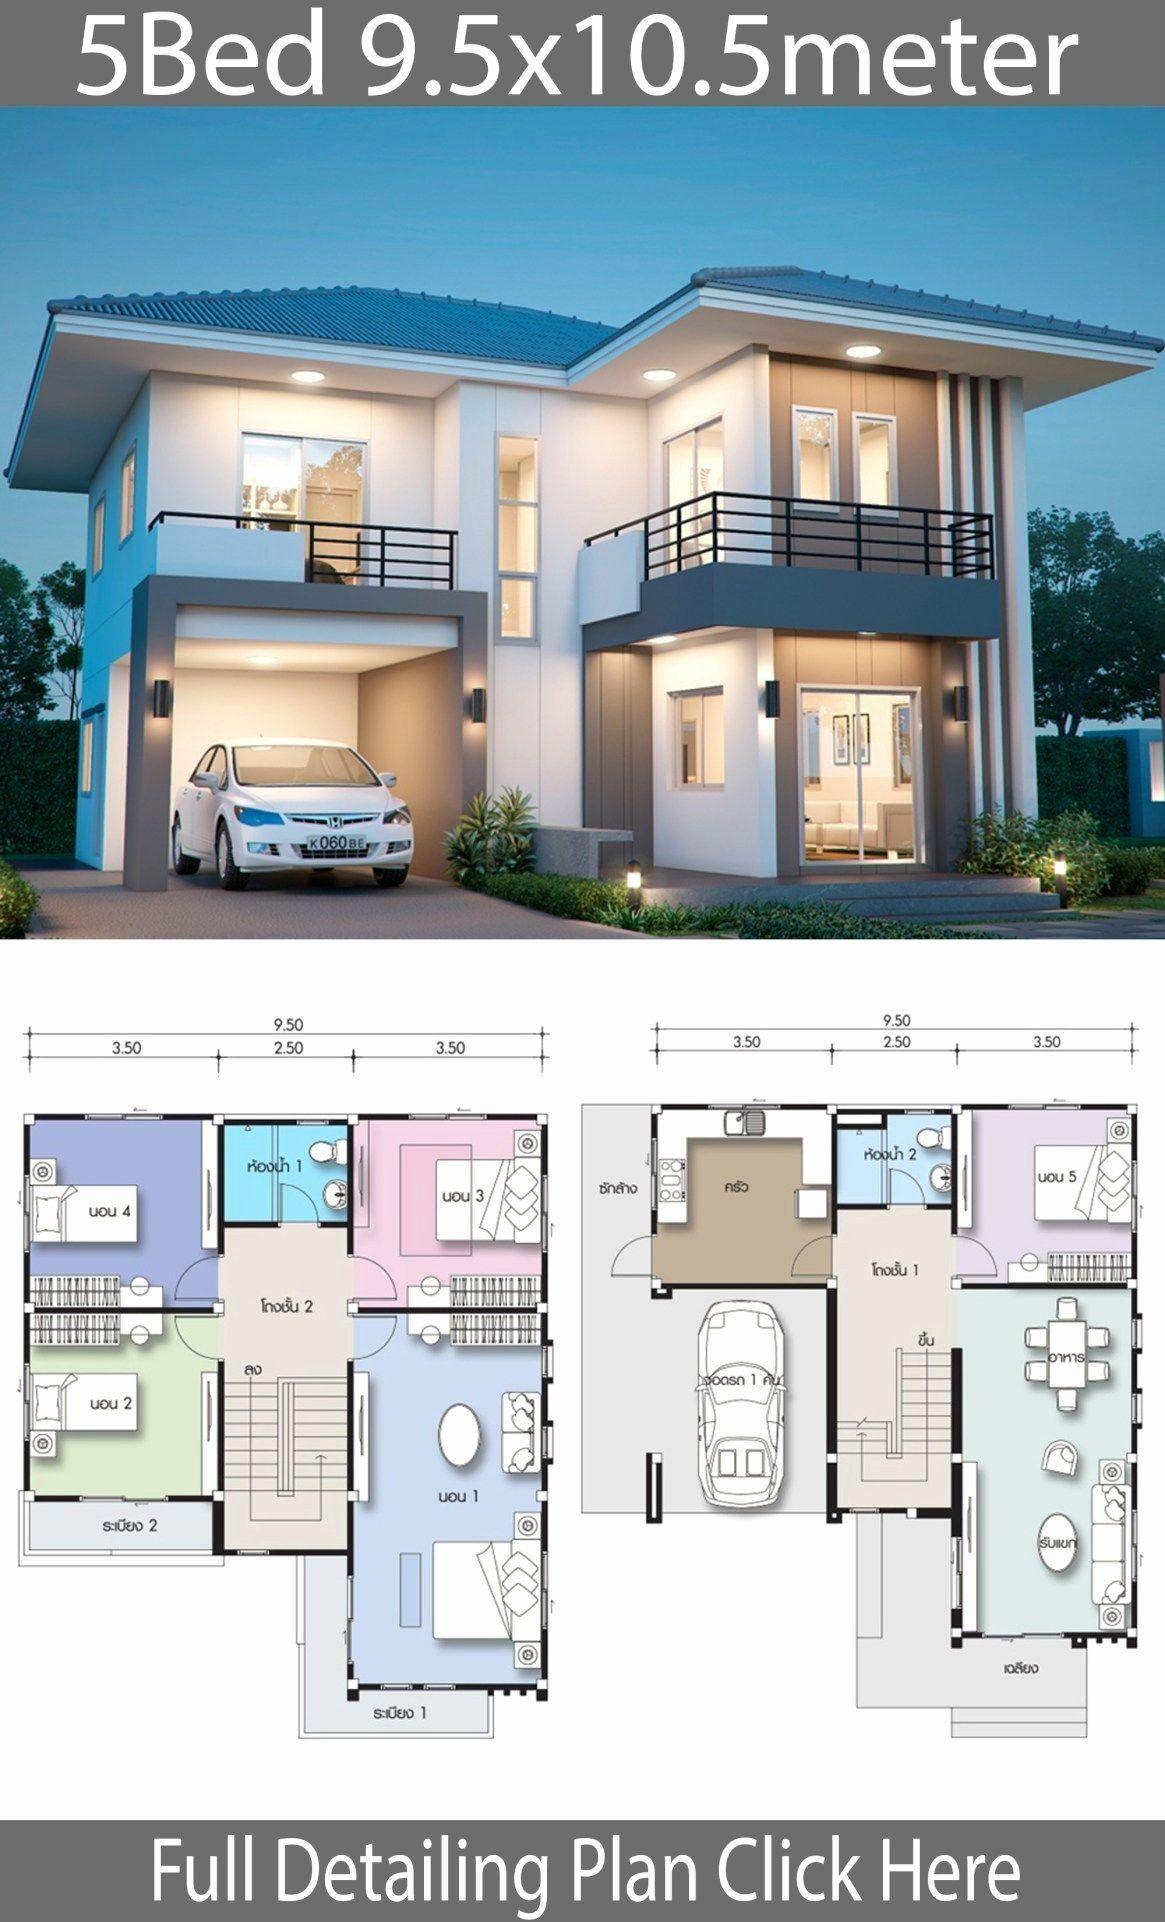 5 Br House Plans Fresh House Design Plan 9 5x10 5m With 5 Bedrooms In 2020 Duplex House Design Duplex House Plans Simple House Design